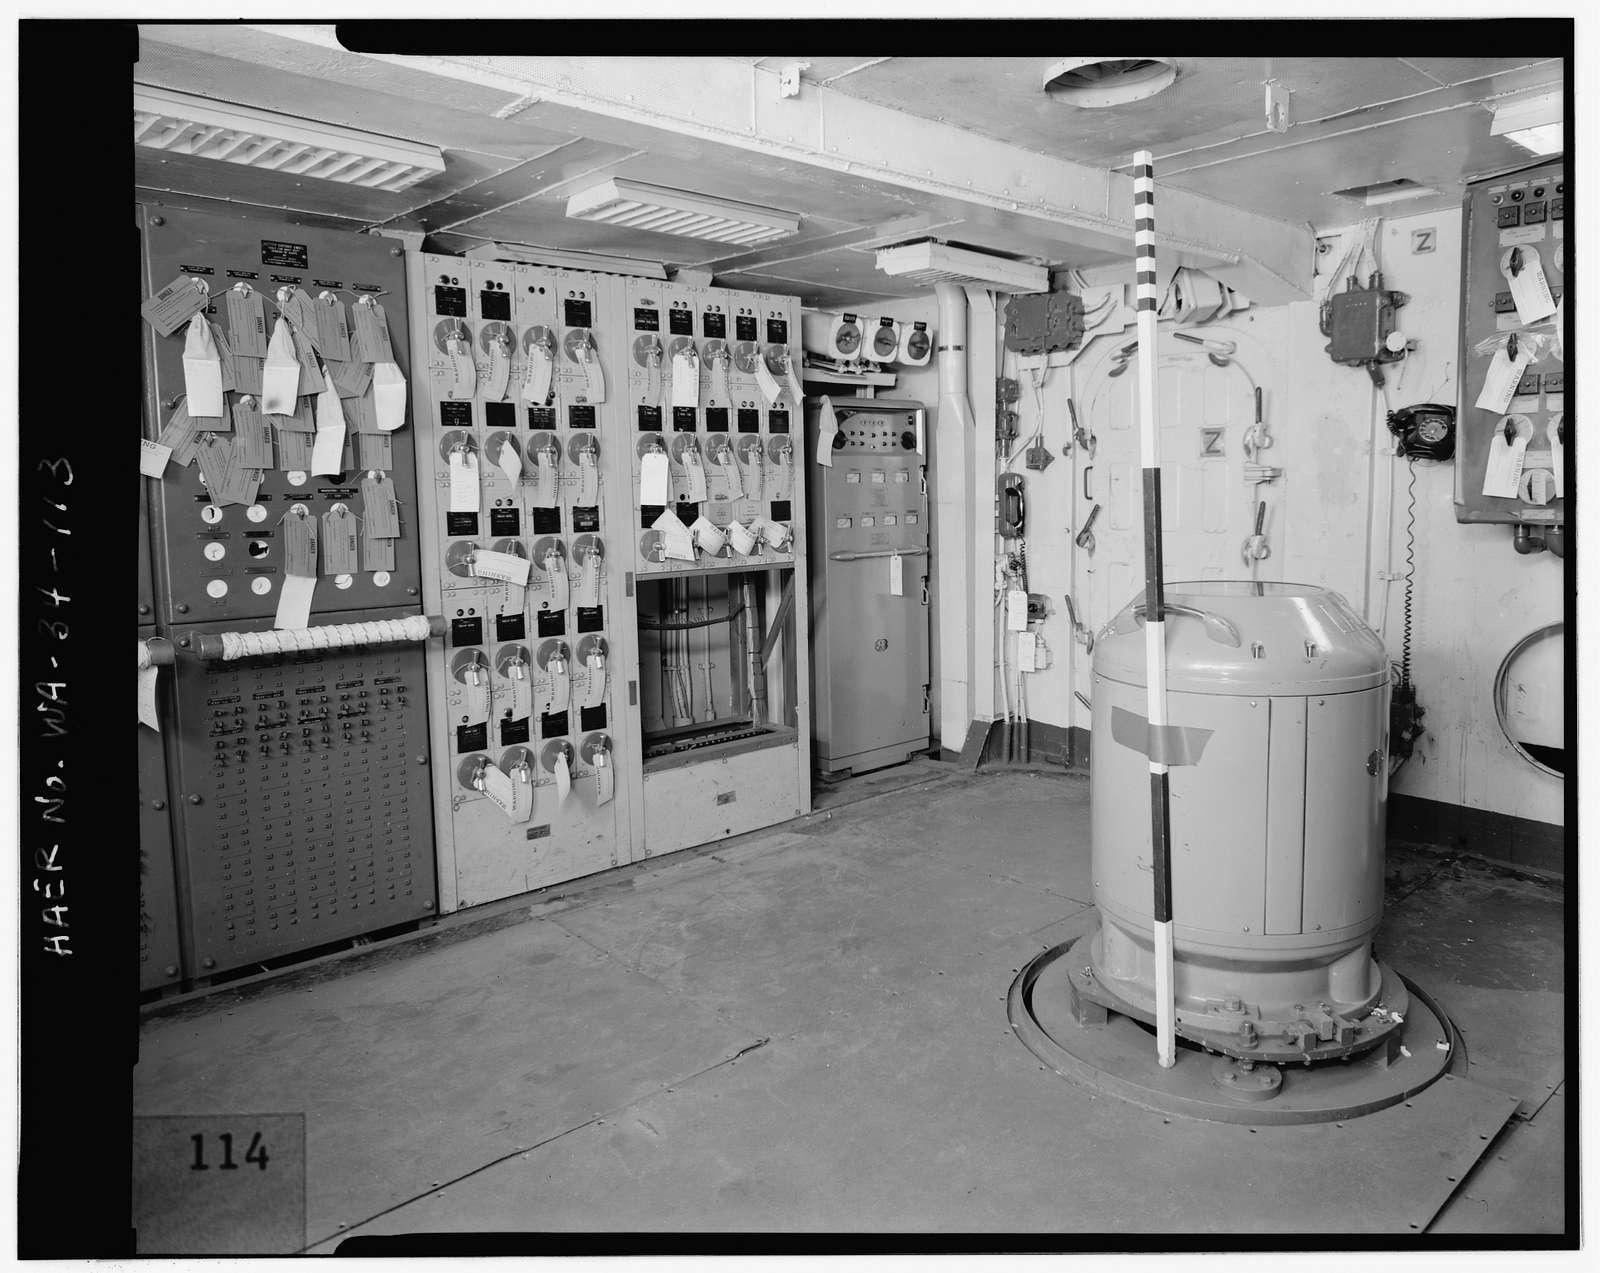 U.S.S. HORNET, Puget Sound Naval Shipyard, Sinclair Inlet, Bremerton, Kitsap County, WA